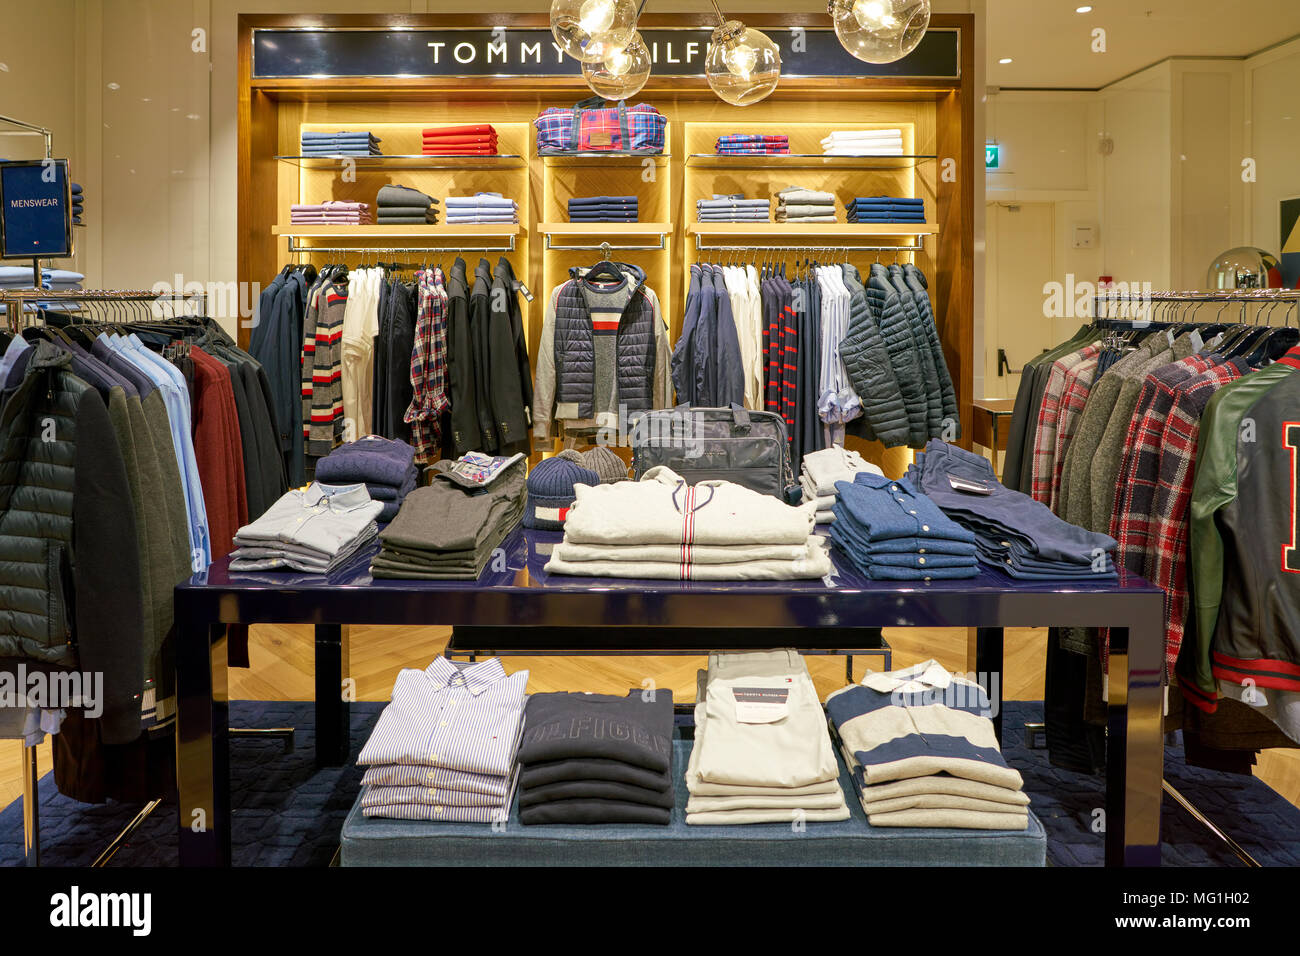 ca514e6e0c1cbb Tommy Hilfiger Flagship Store Interior Stock Photos   Tommy Hilfiger ...